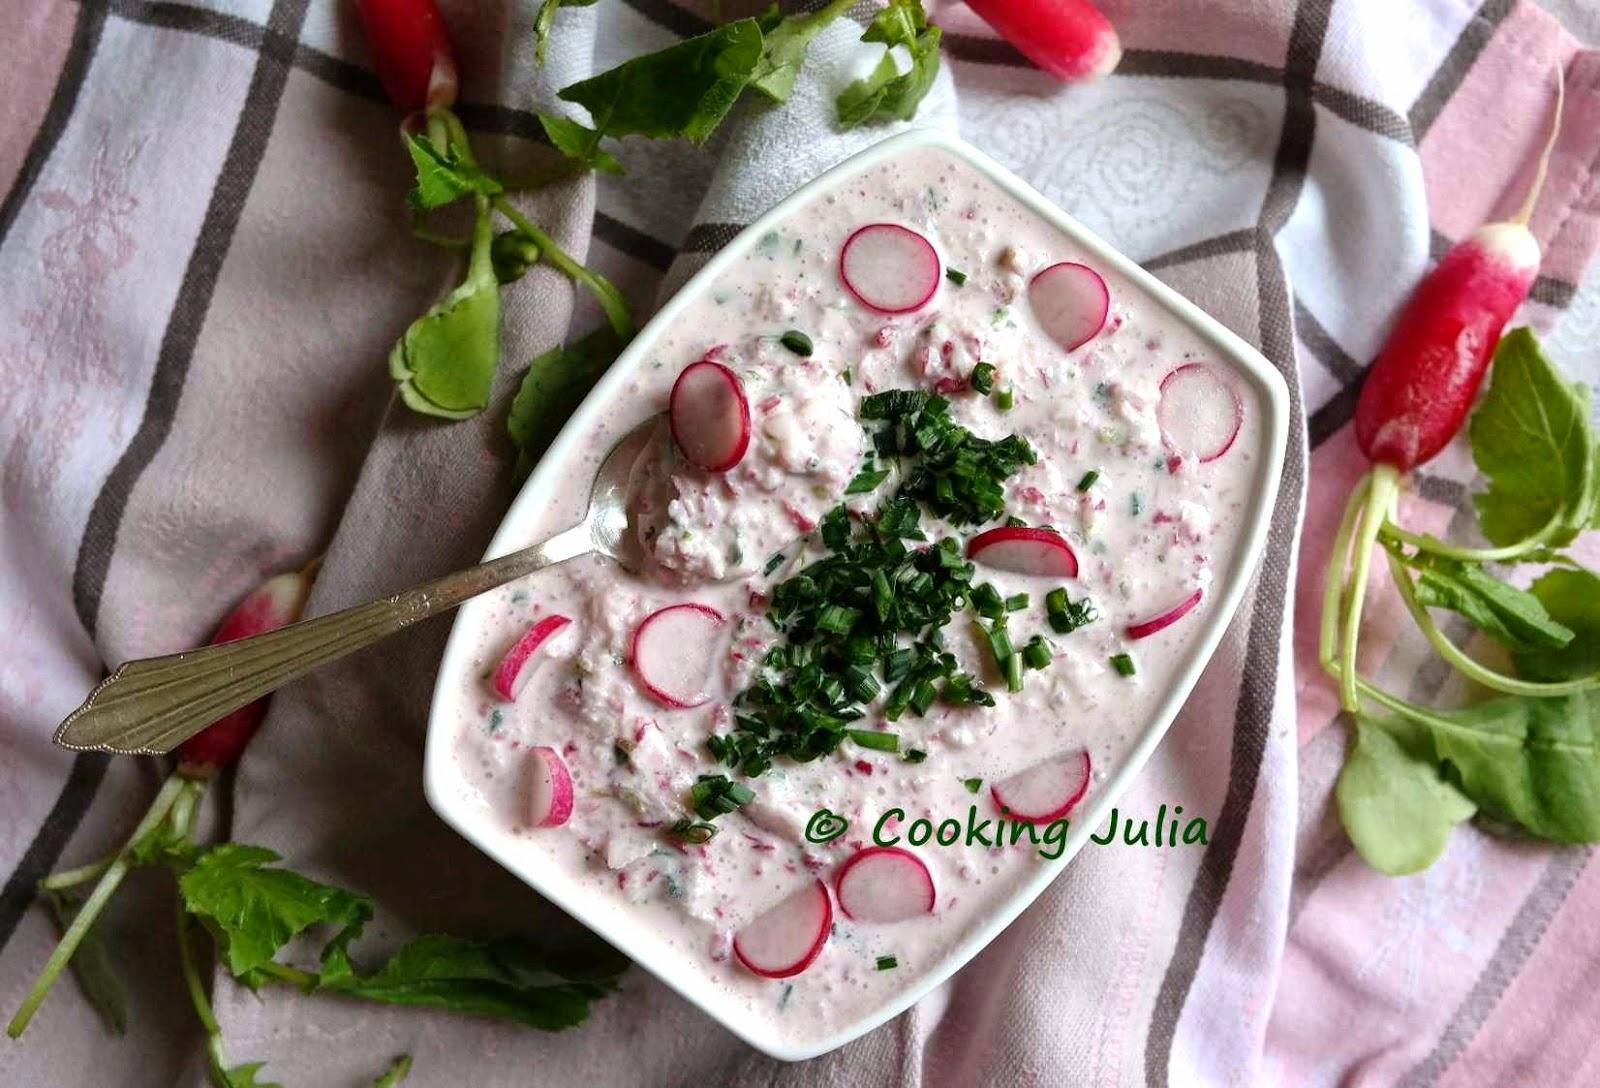 Cooking julia tartinade de radis roses - Radis rose de chine ...